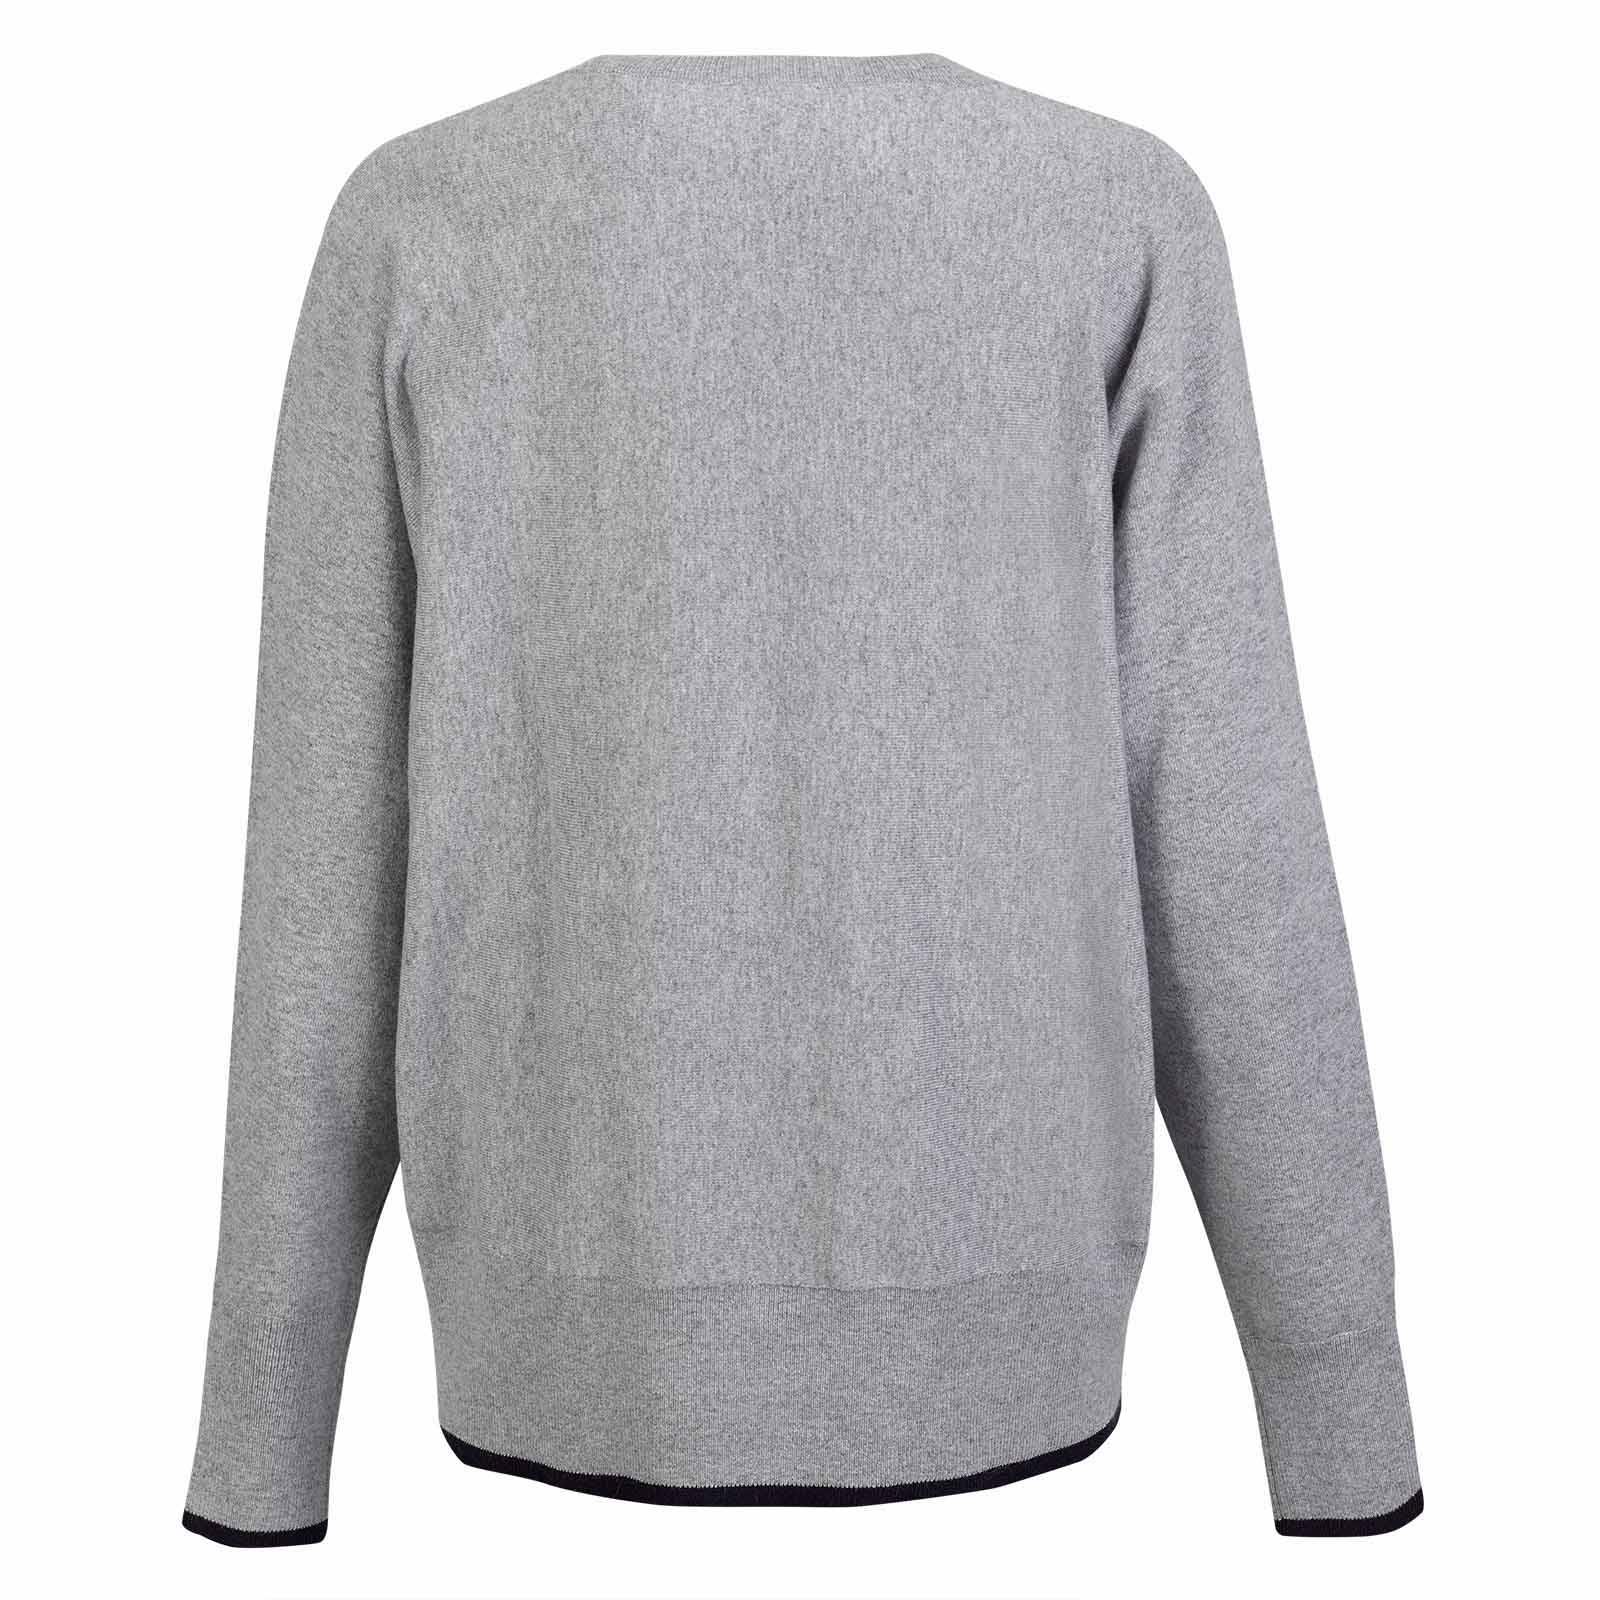 Damen Cold Protection V-Pullover aus weicher Angora-Blend